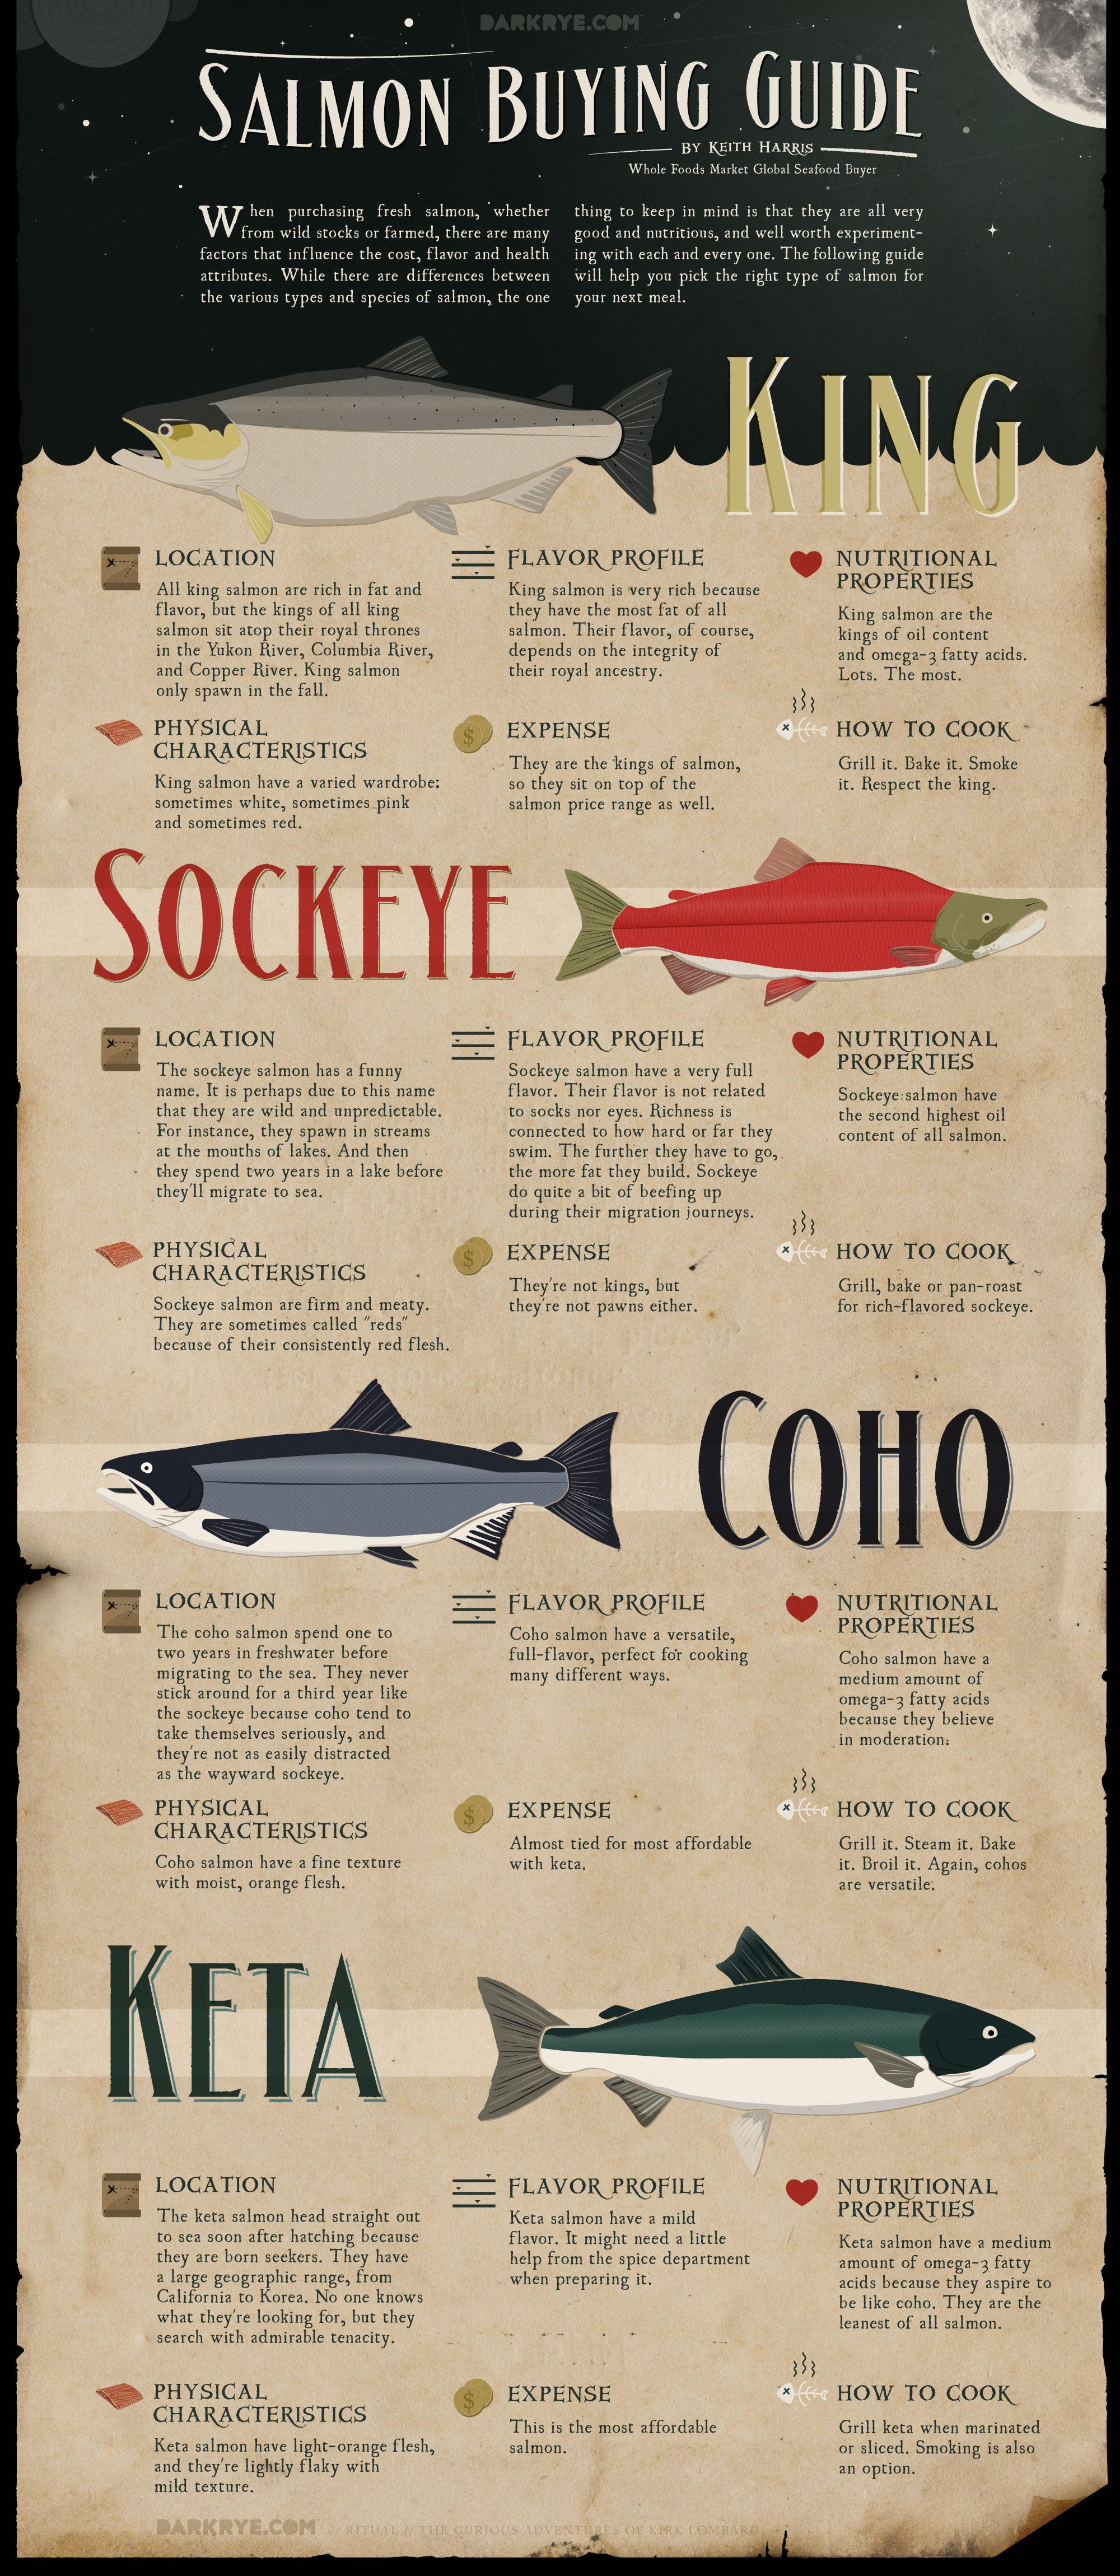 Salmon Buying Guide